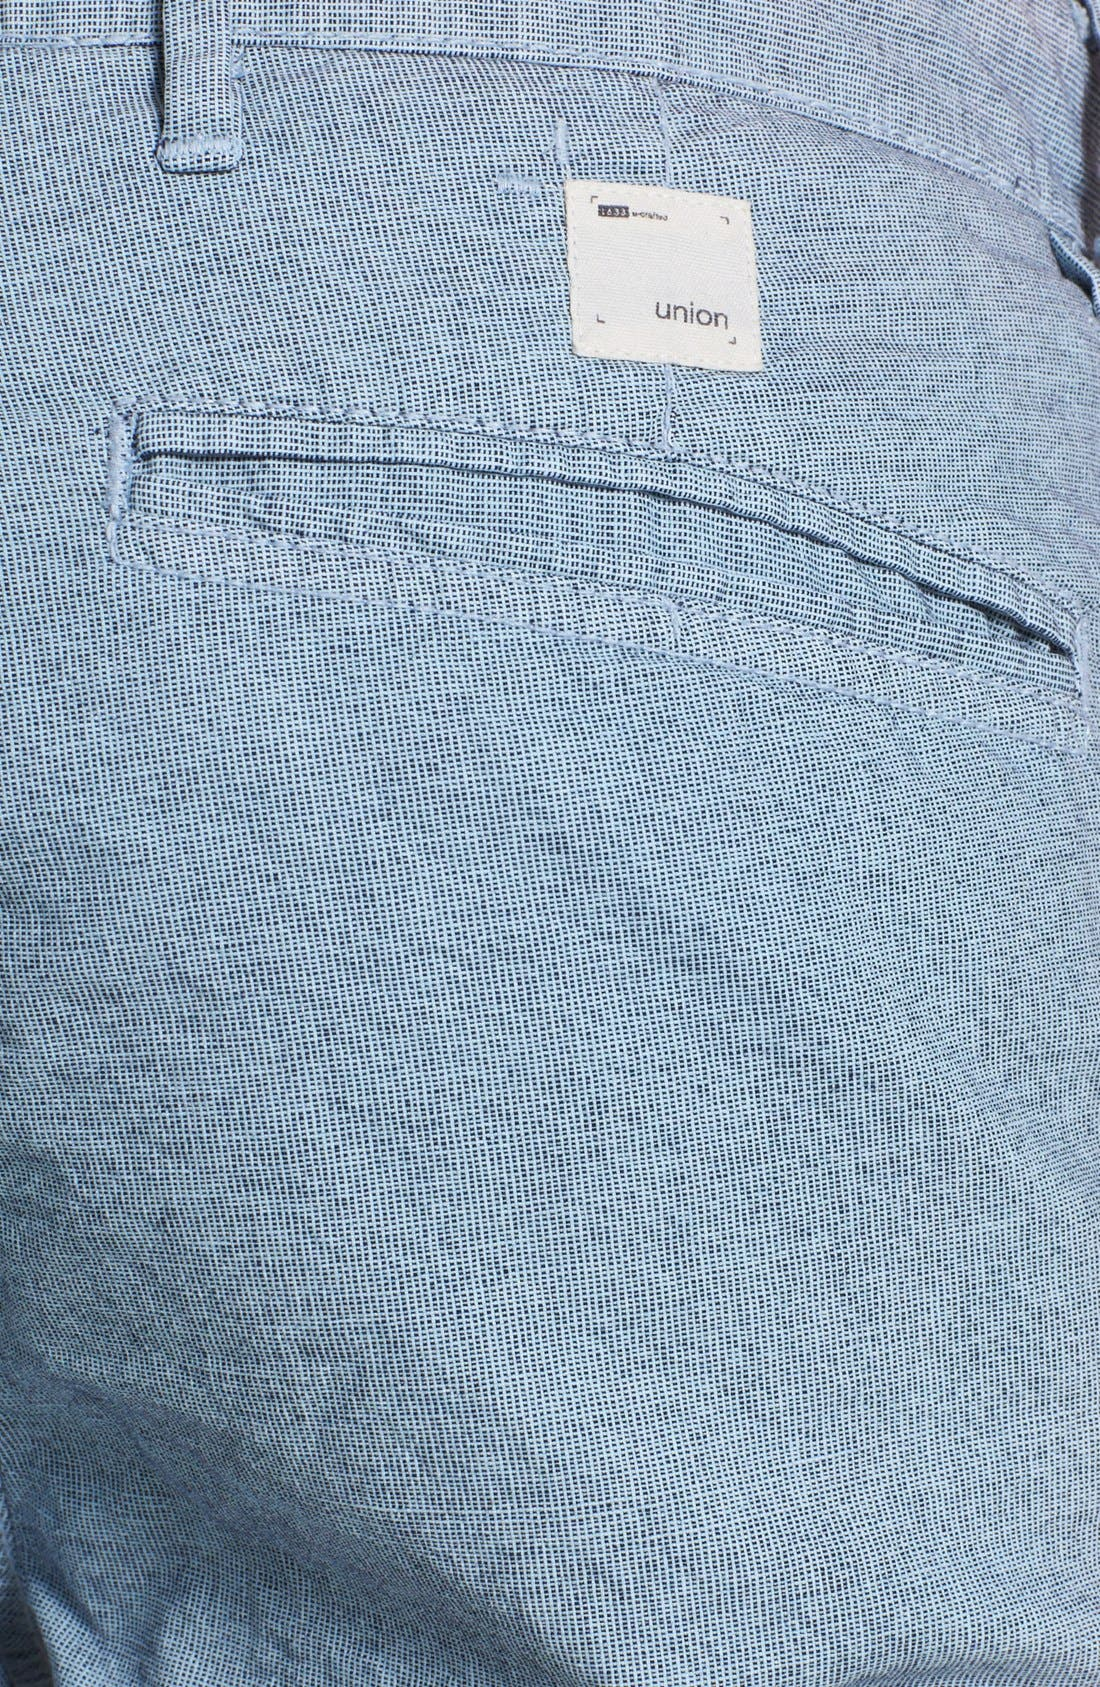 Alternate Image 3  - Union 'Georgetown' Chino Shorts